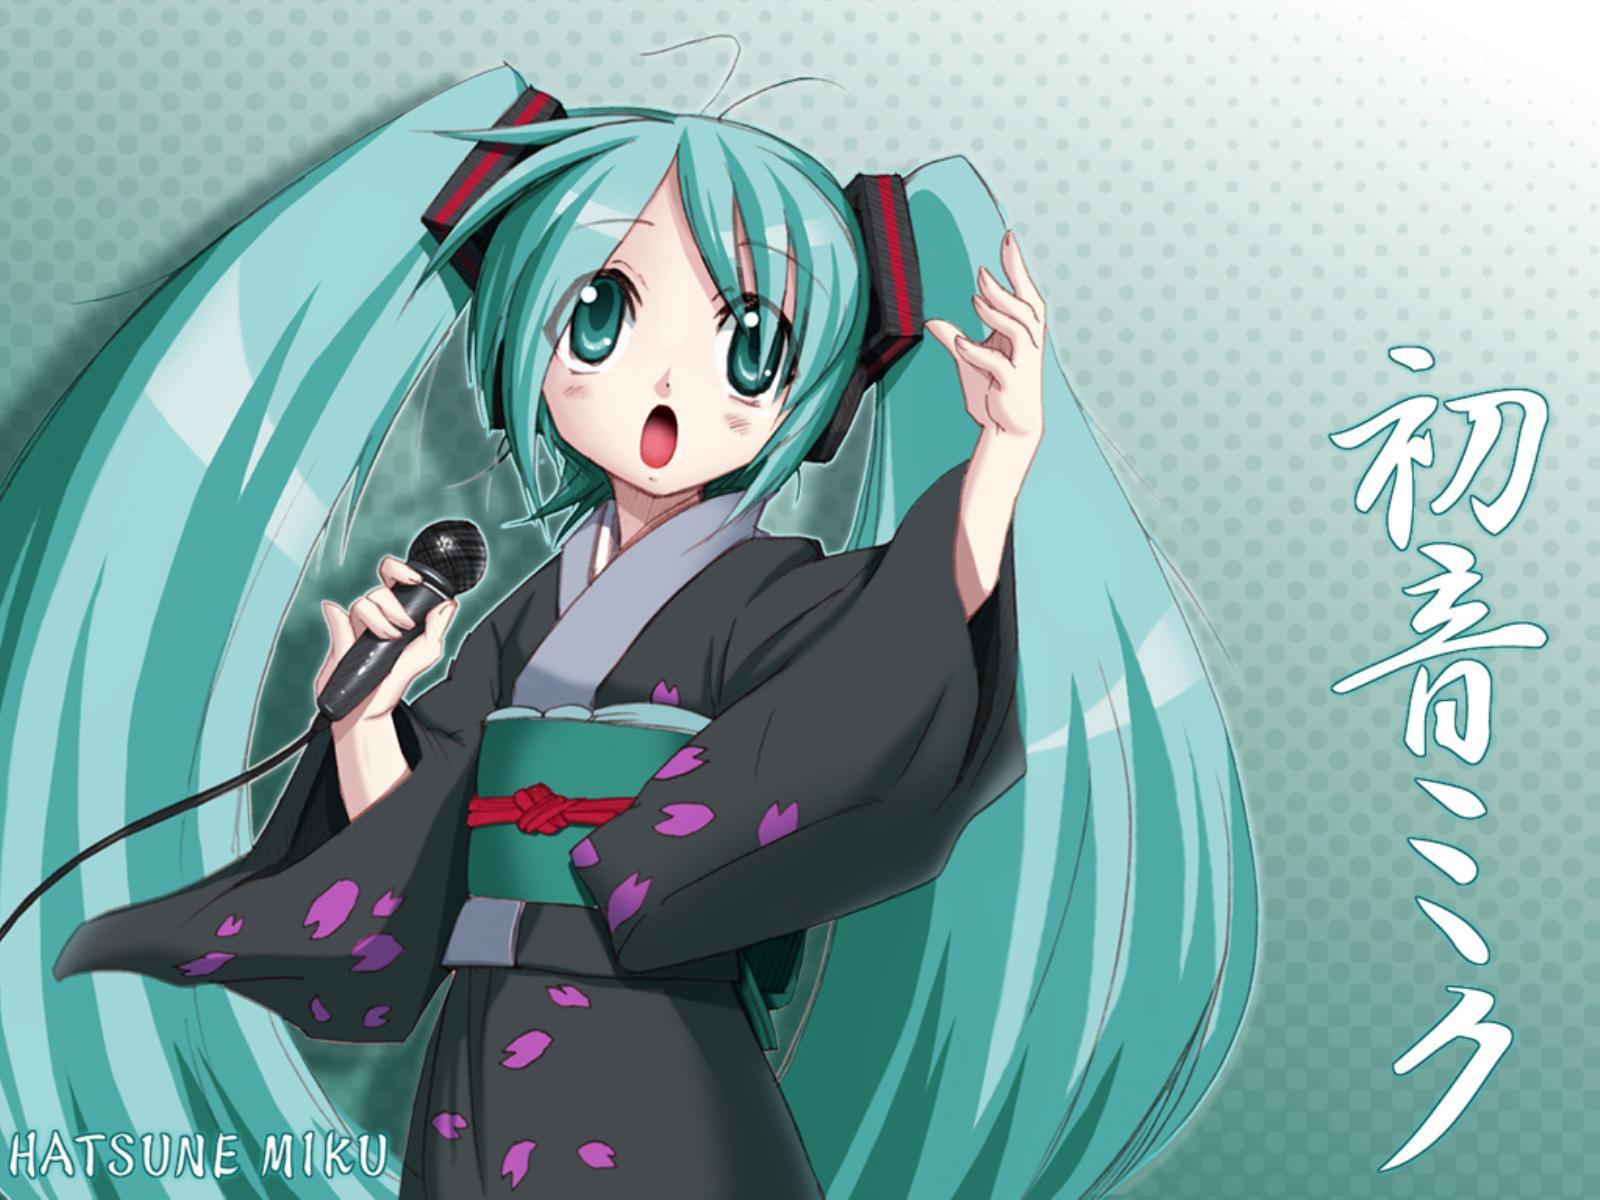 http://blog-imgs-35.fc2.com/k/y/o/kyonn3/HatsuneMiku234.jpg